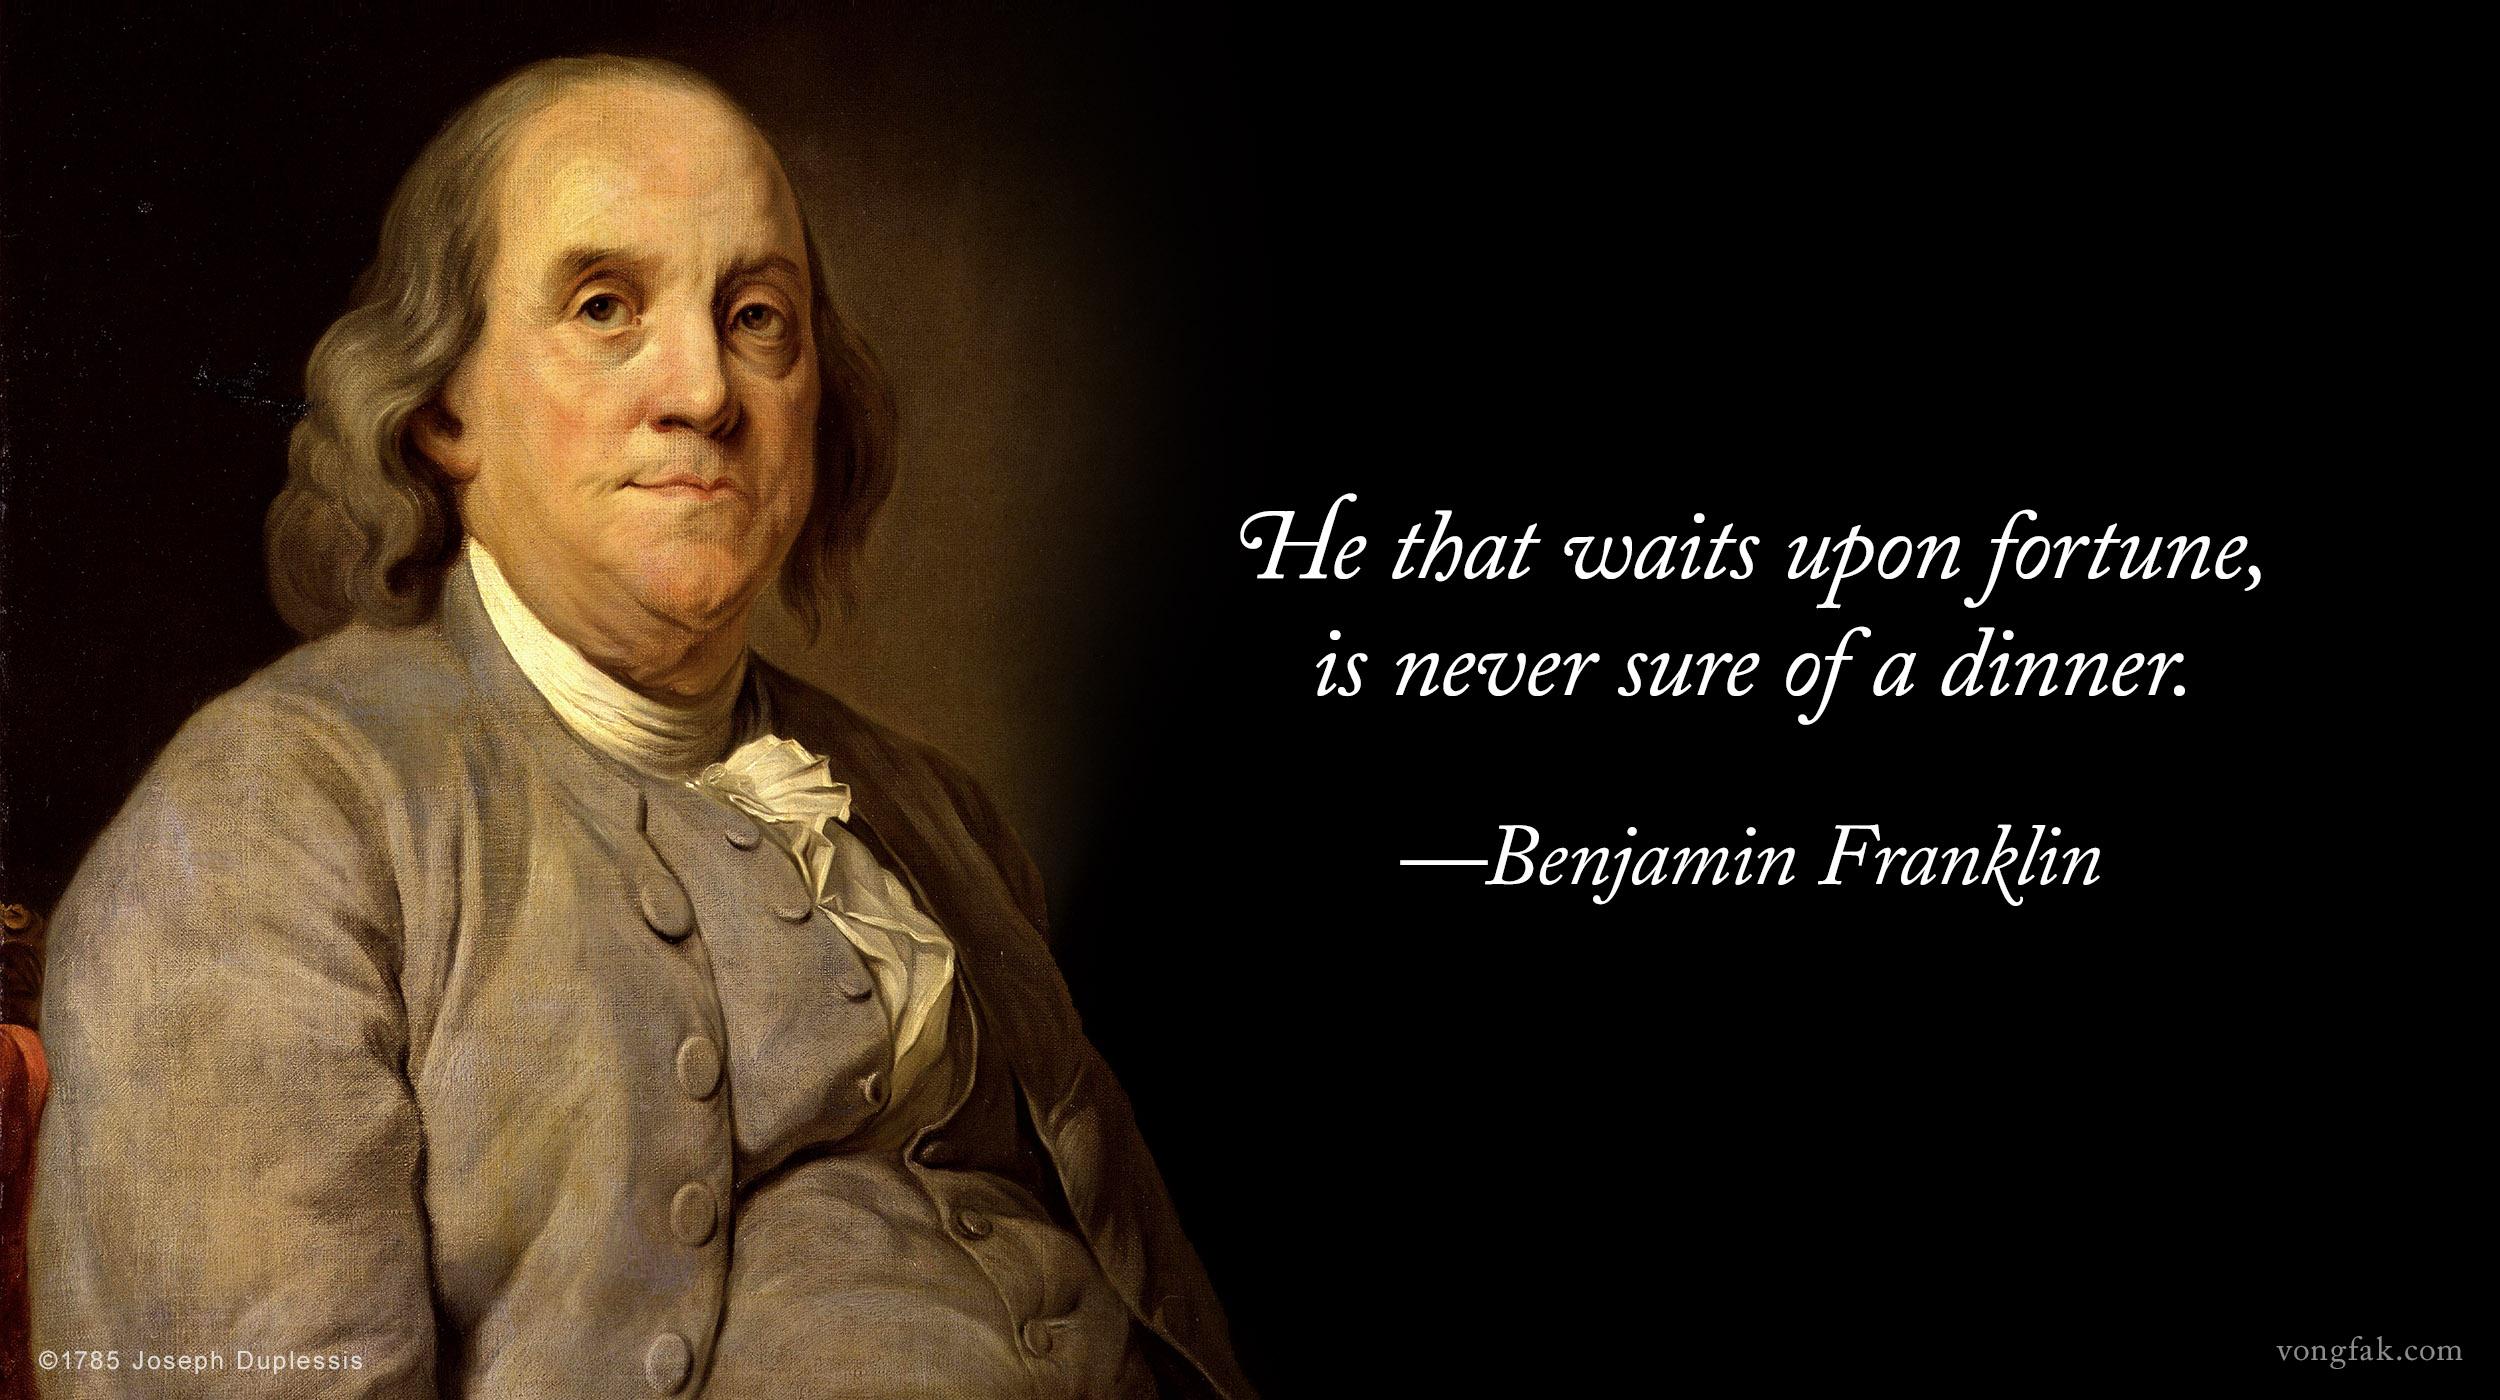 Quote_BenFranklin_25.jpg